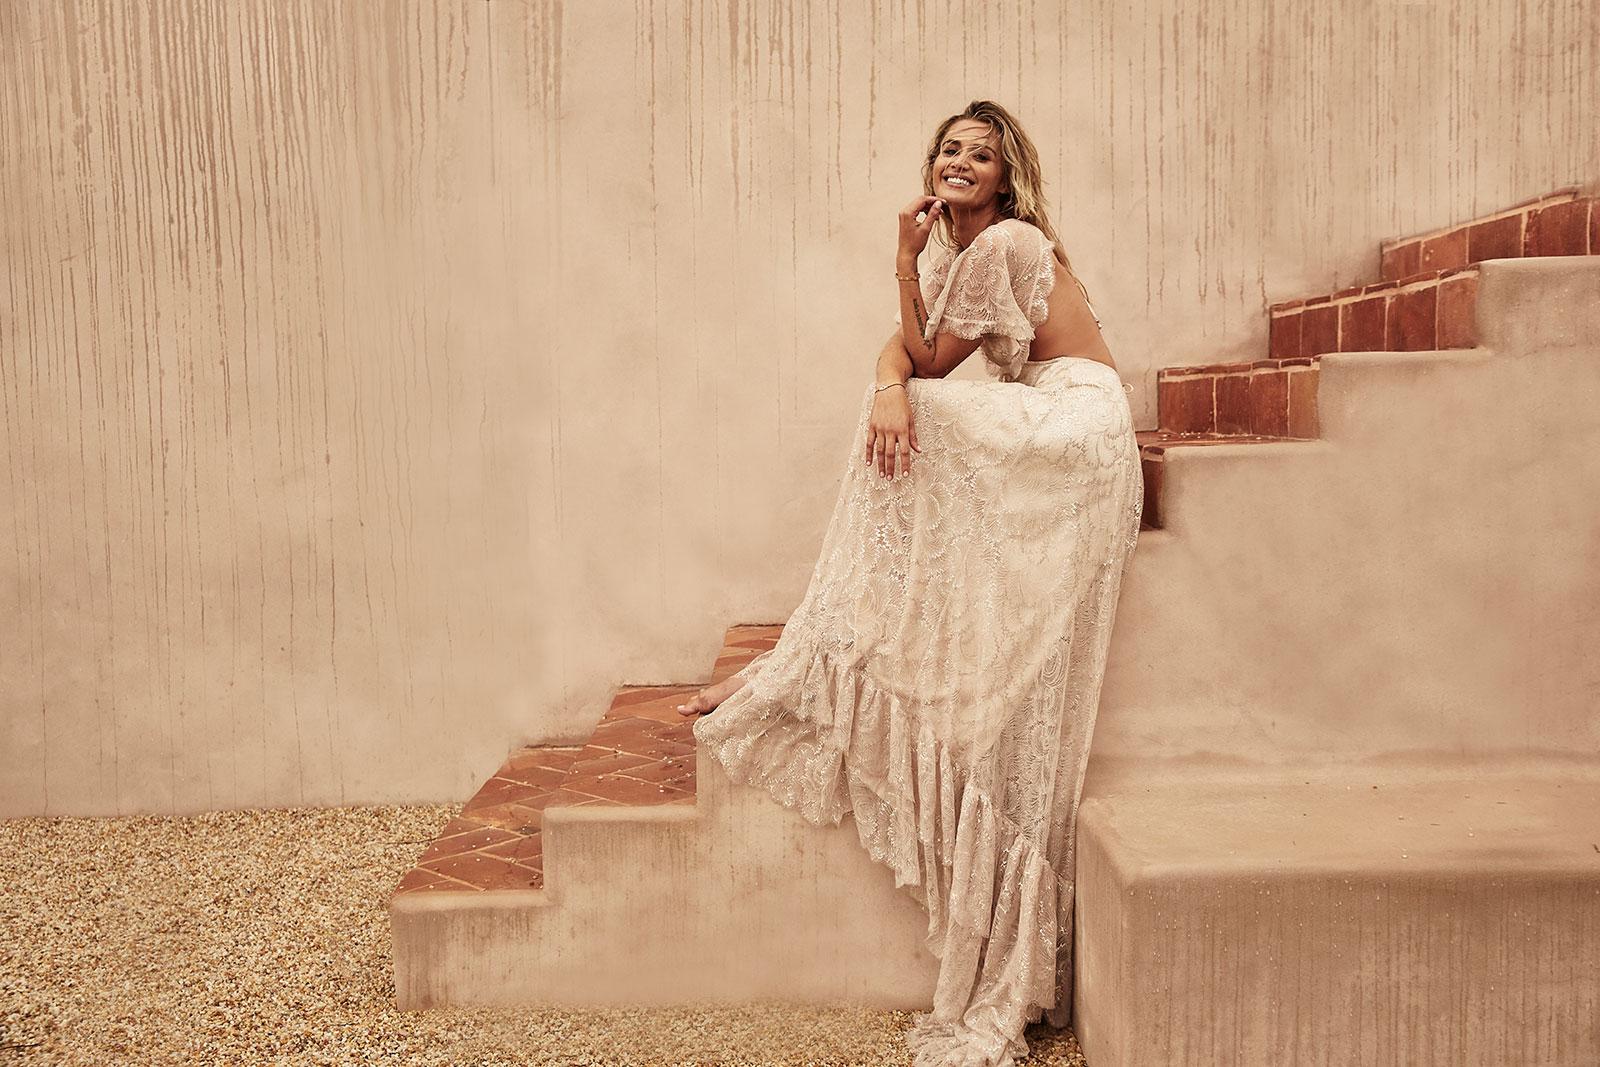 Capri-Gown-Grace-Loves-Lace-La-Bamba-Collection-3-Low-Res.jpg